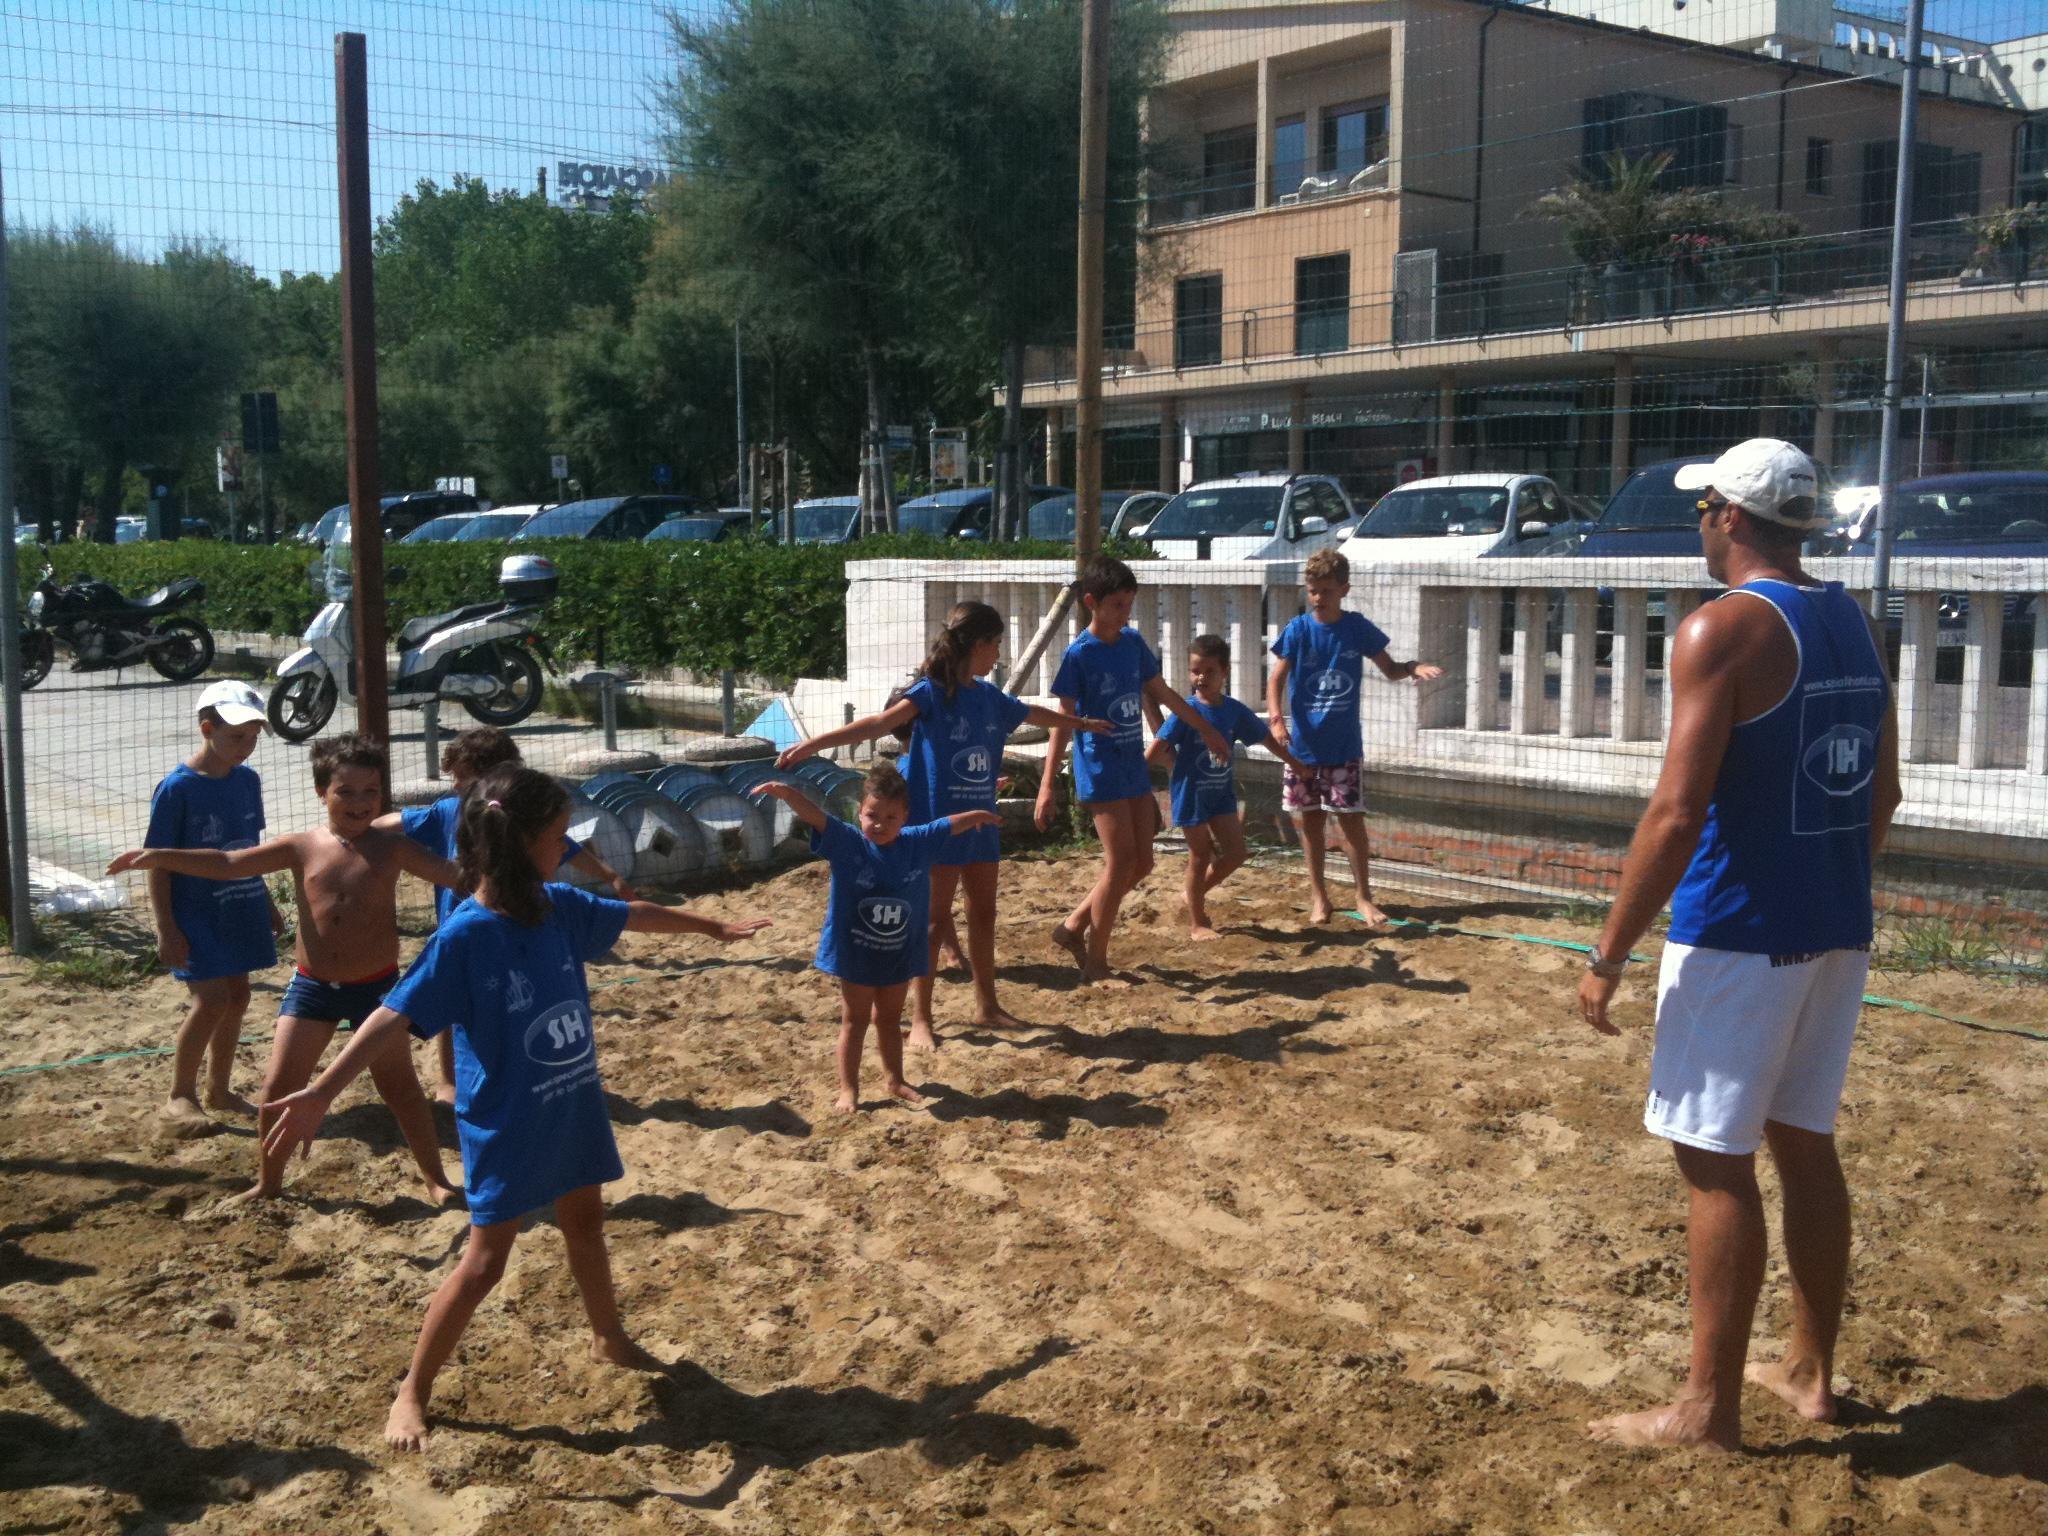 Beach camp bagno 18 rimini marina centro mini beach volley beach volley emilia romagna - Bagno 18 rimini ...